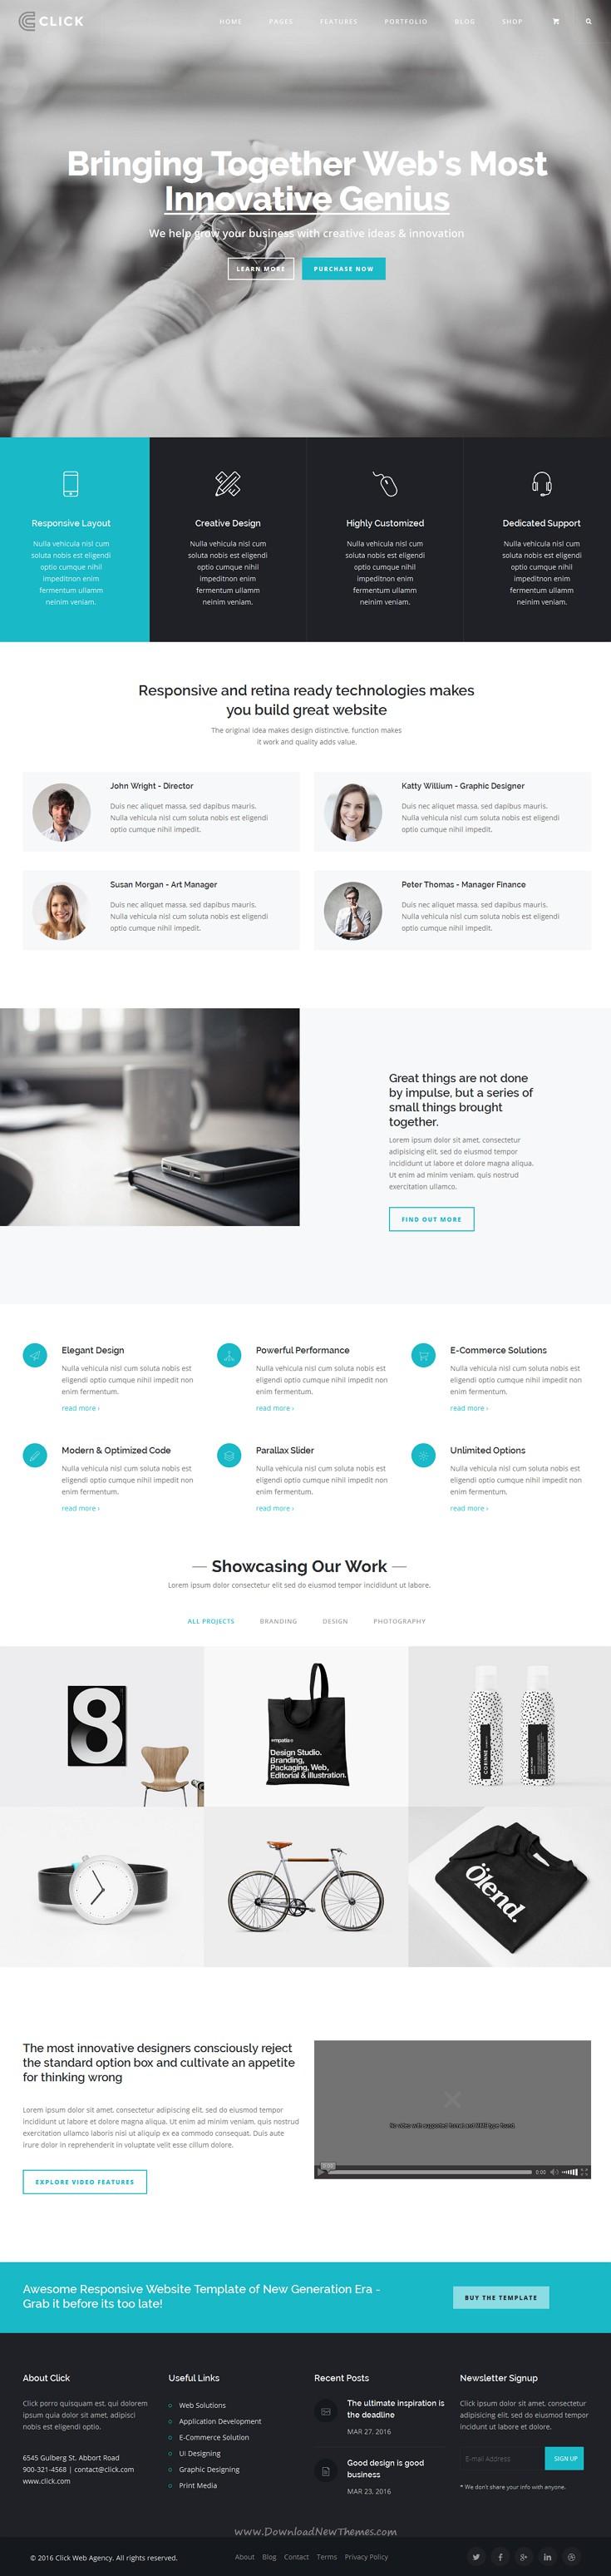 Click - Multi-Purpose Responsive Website Template | Webdesign ...